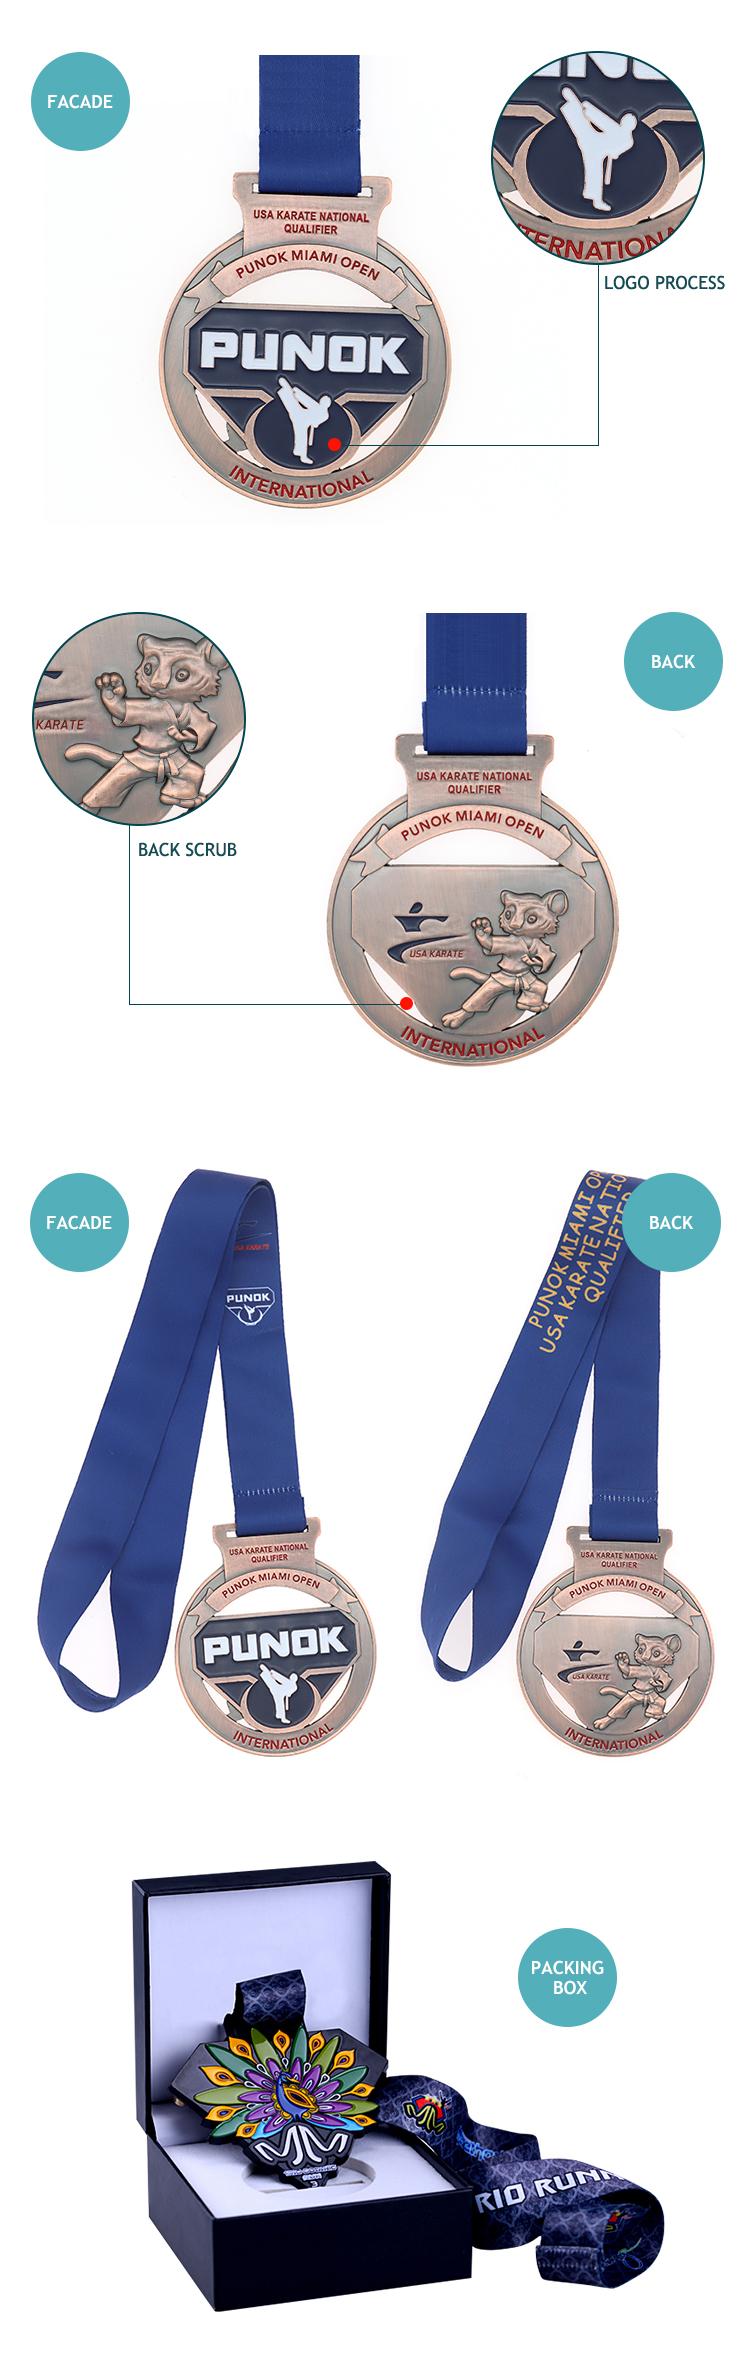 Custom-made wholesale medal taekwondo punok medallas